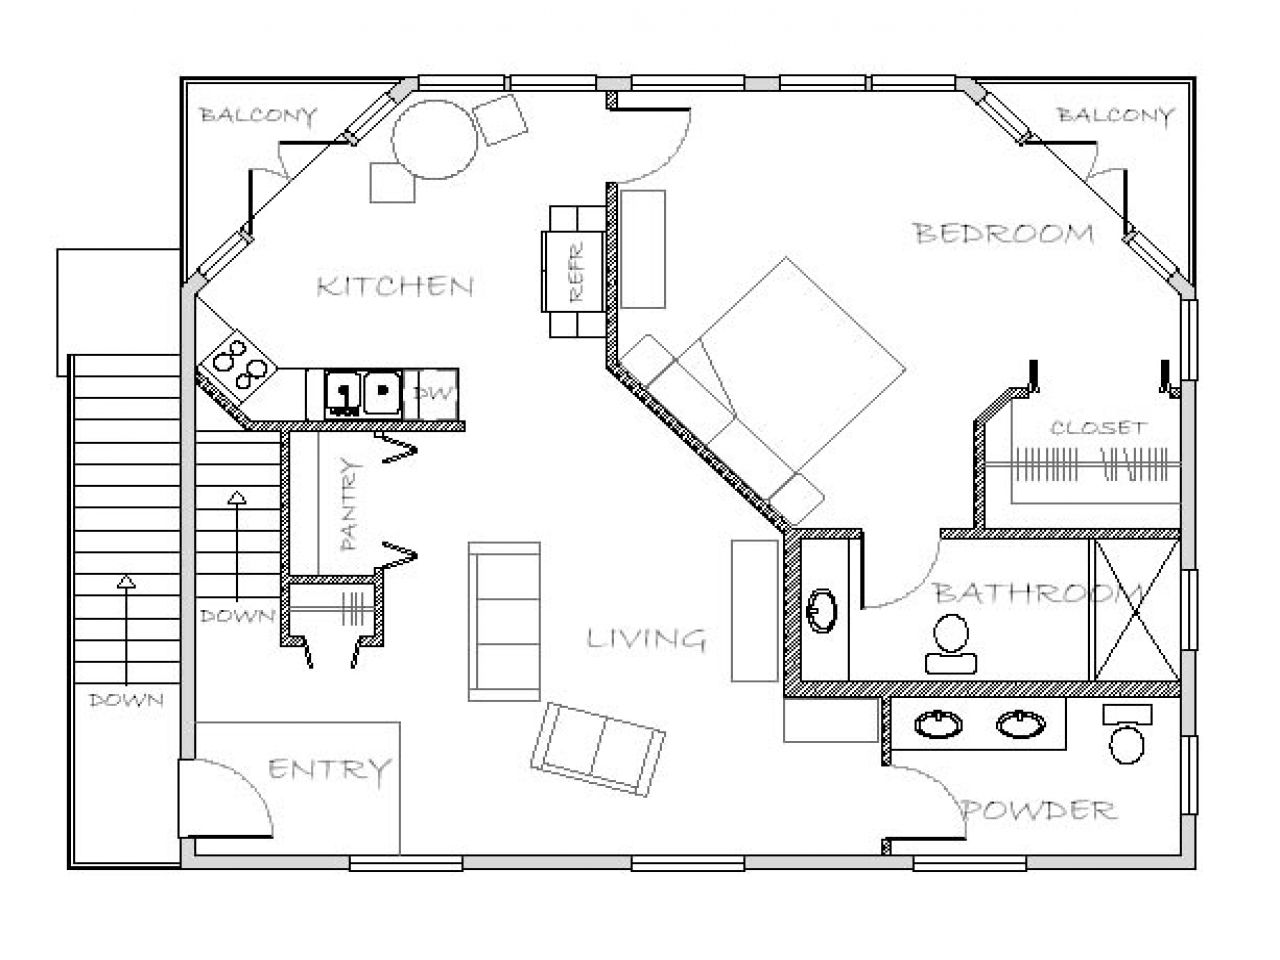 Erdgeschoss haus front design small motherinlaw floor plans  mother in law house plans with